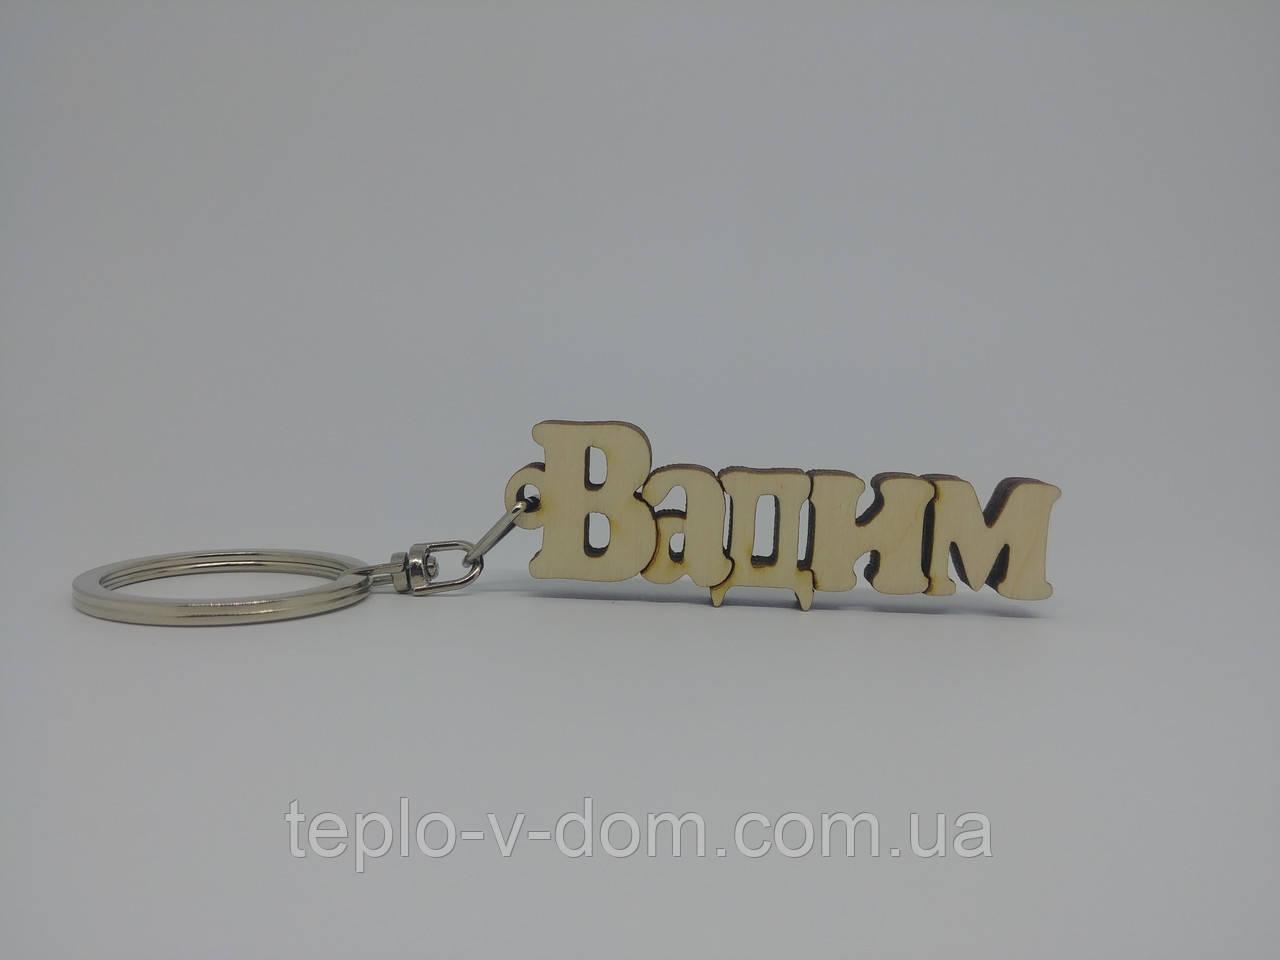 Деревянный брелок Вадим